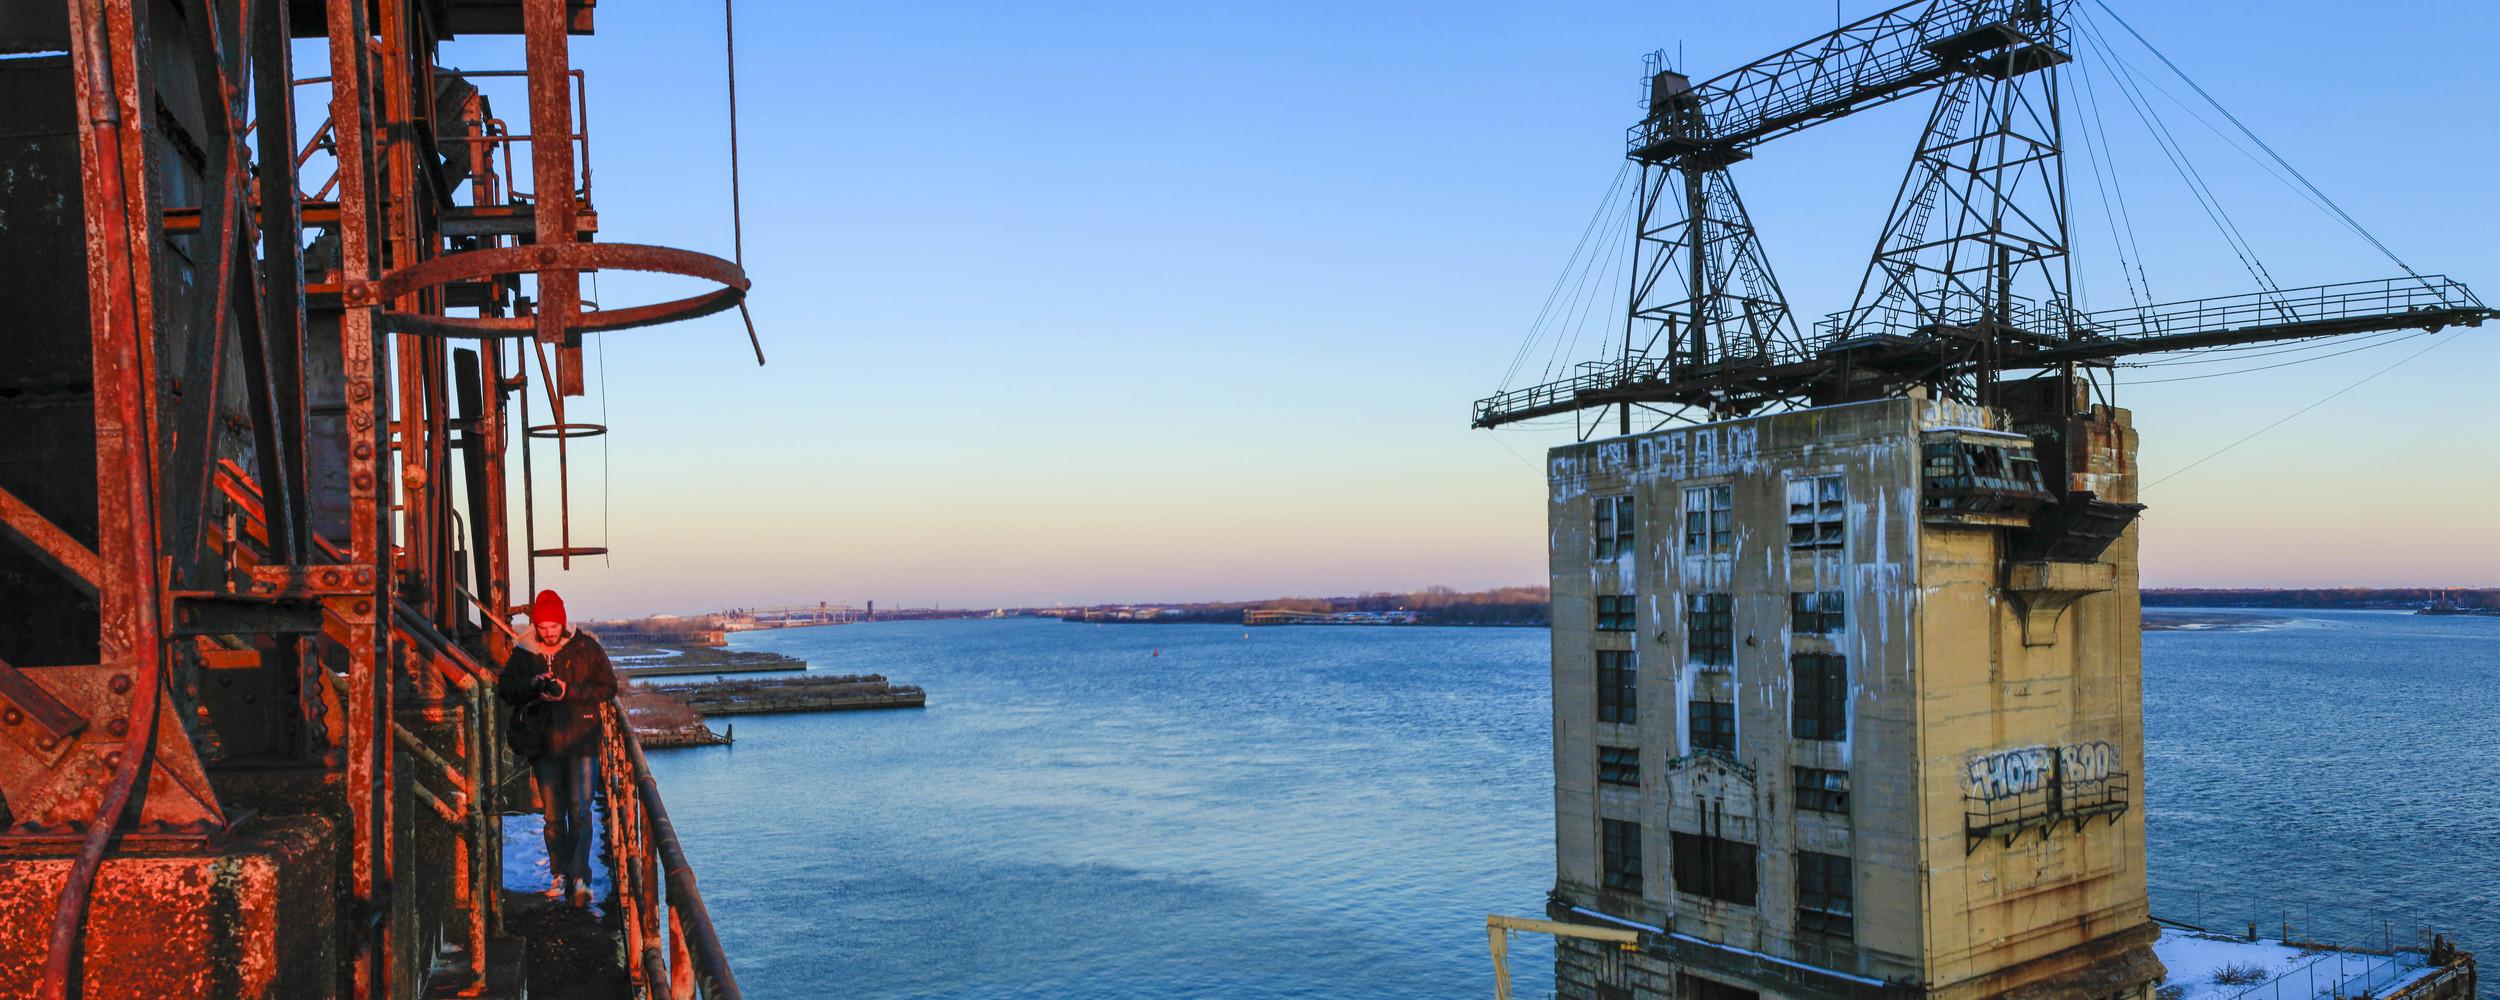 PECO Delaware Power Station (Defunct)